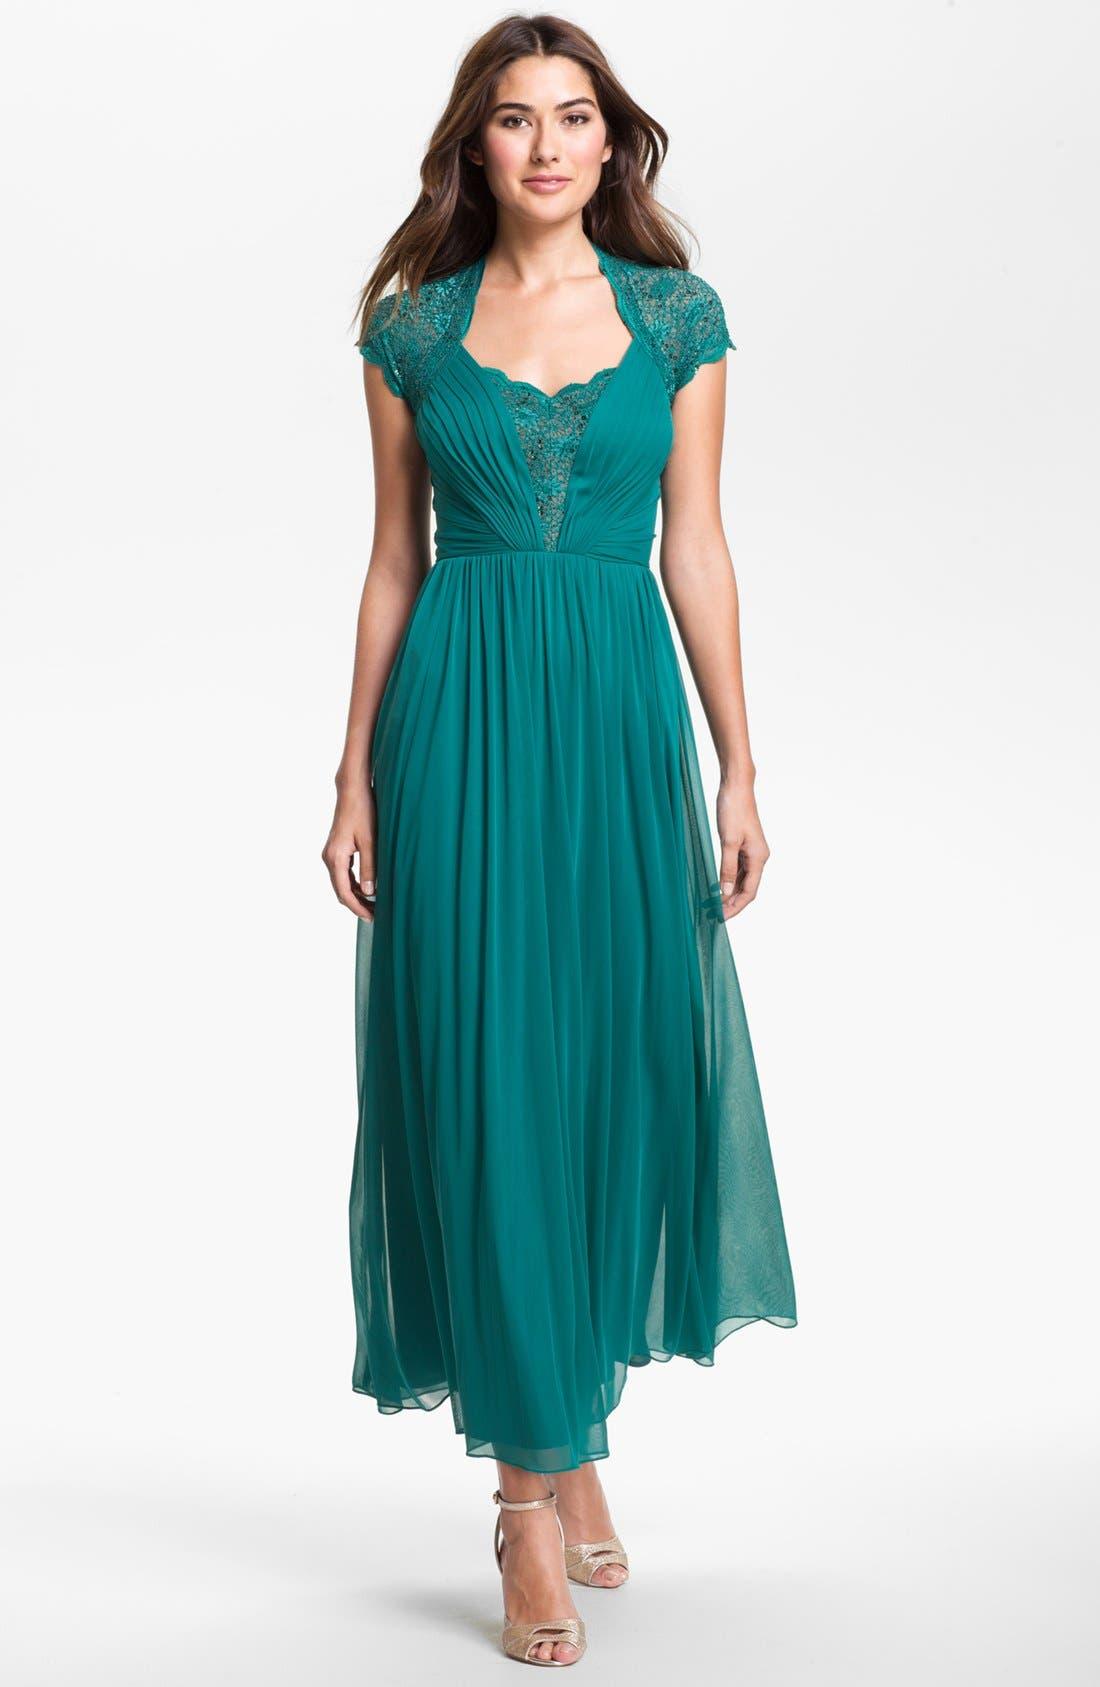 Alternate Image 1 Selected - Alex Evenings Lace Appliqué & Pleated Mesh Gown (Petite)